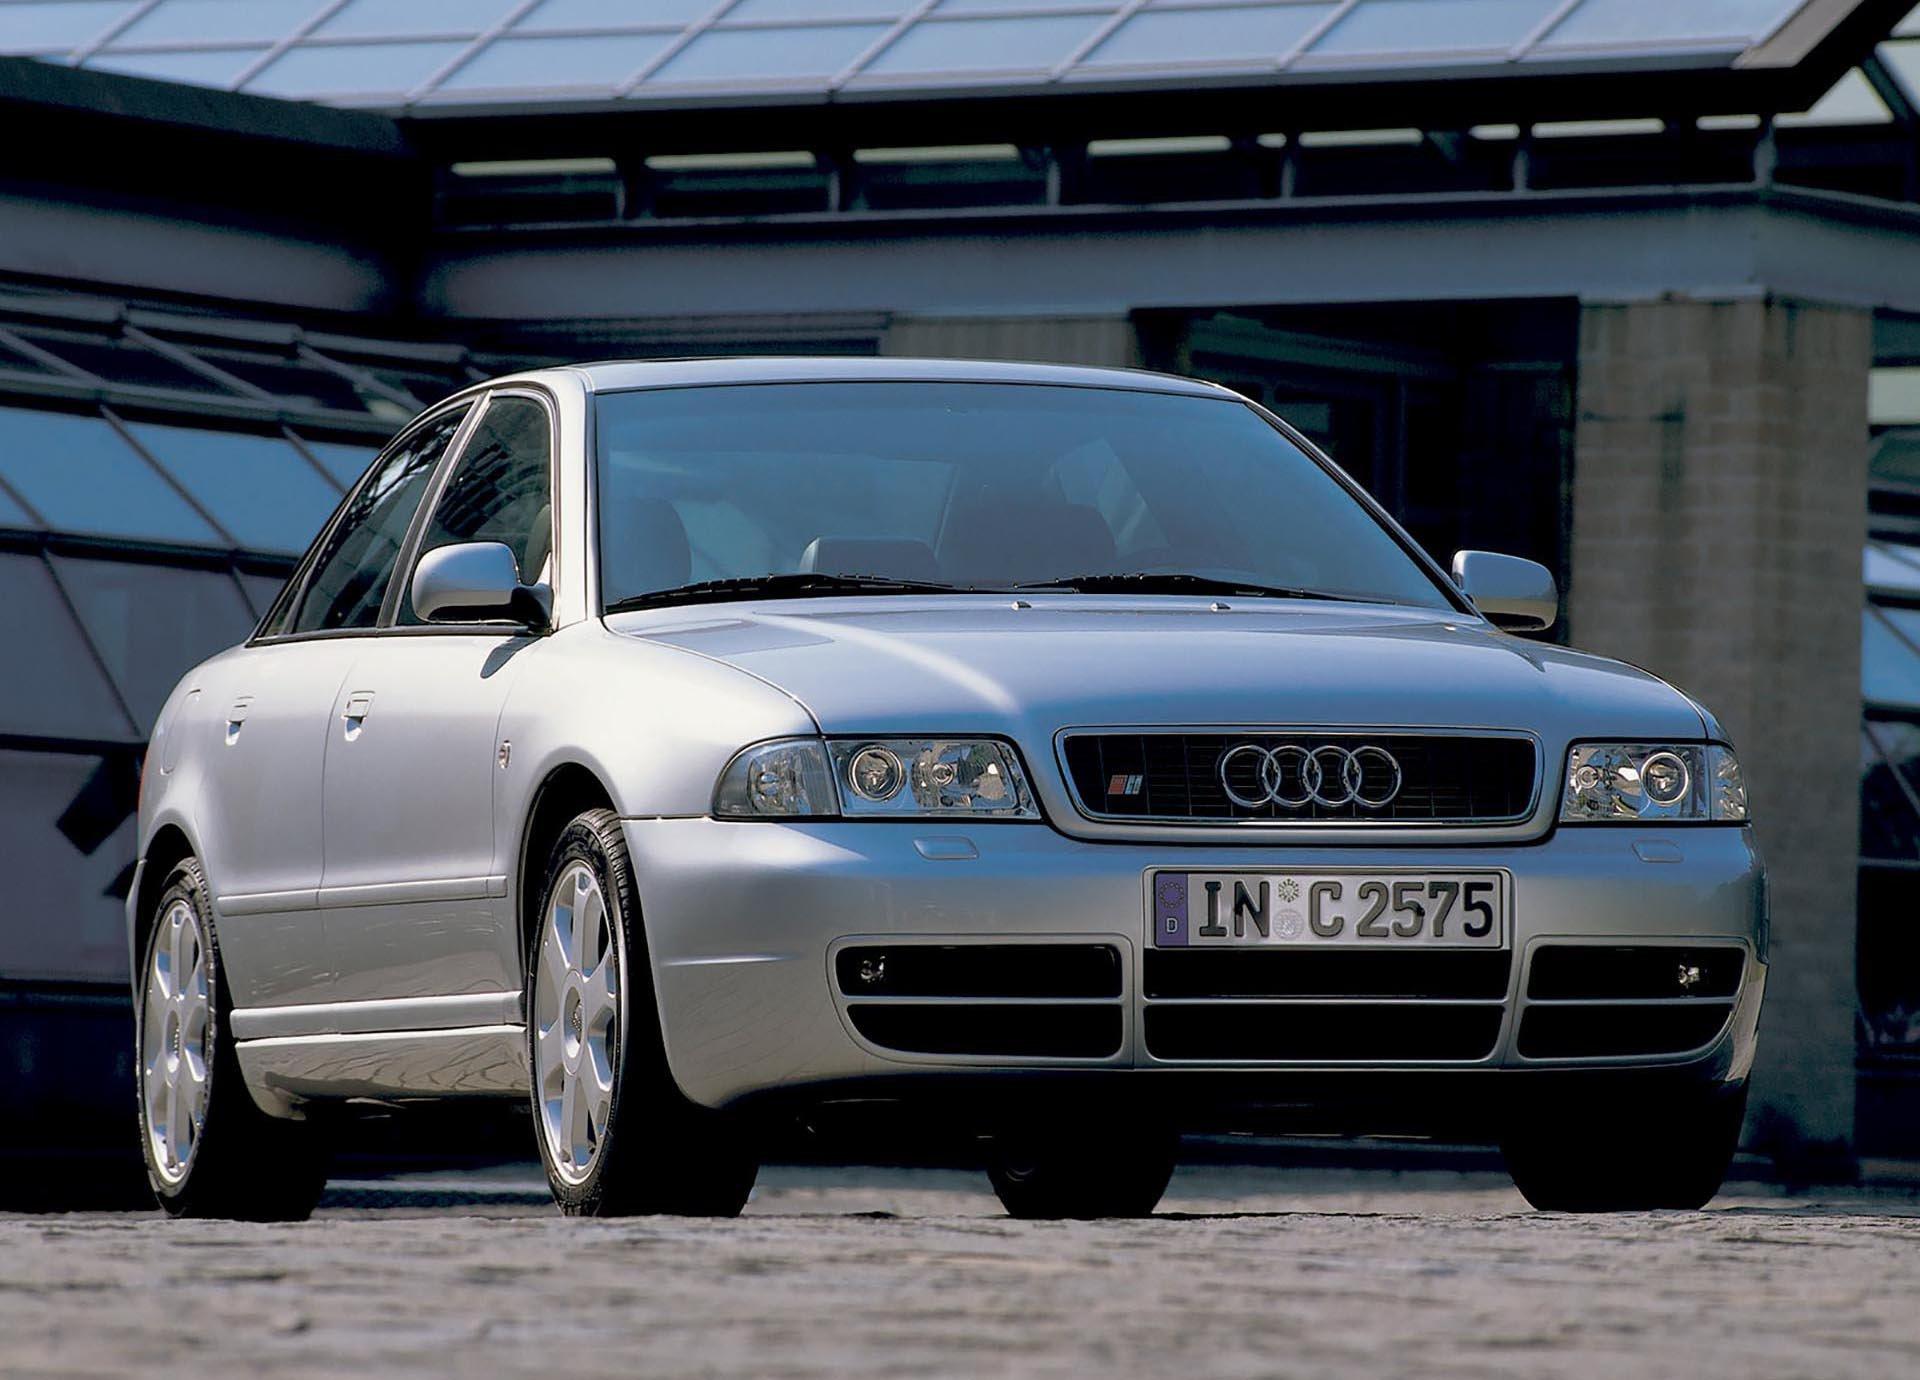 01_B5 Audi S4 2.7t sedan silver front